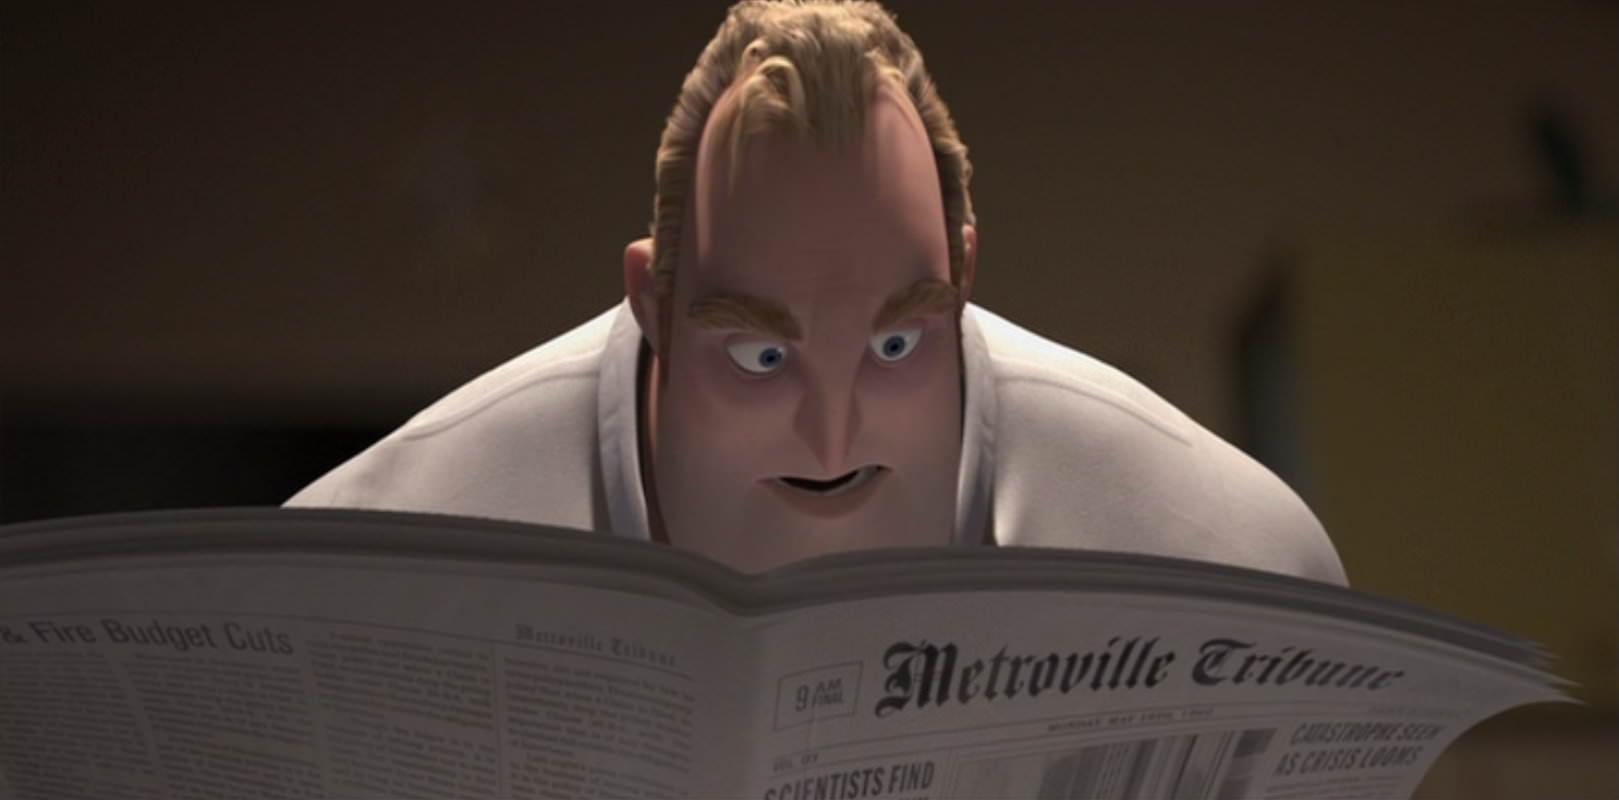 Movie, The Incredibles(美國, 2004) / 超人特攻隊(台) / 超人总动员(中) / 超人特工隊(港), 電影劇照